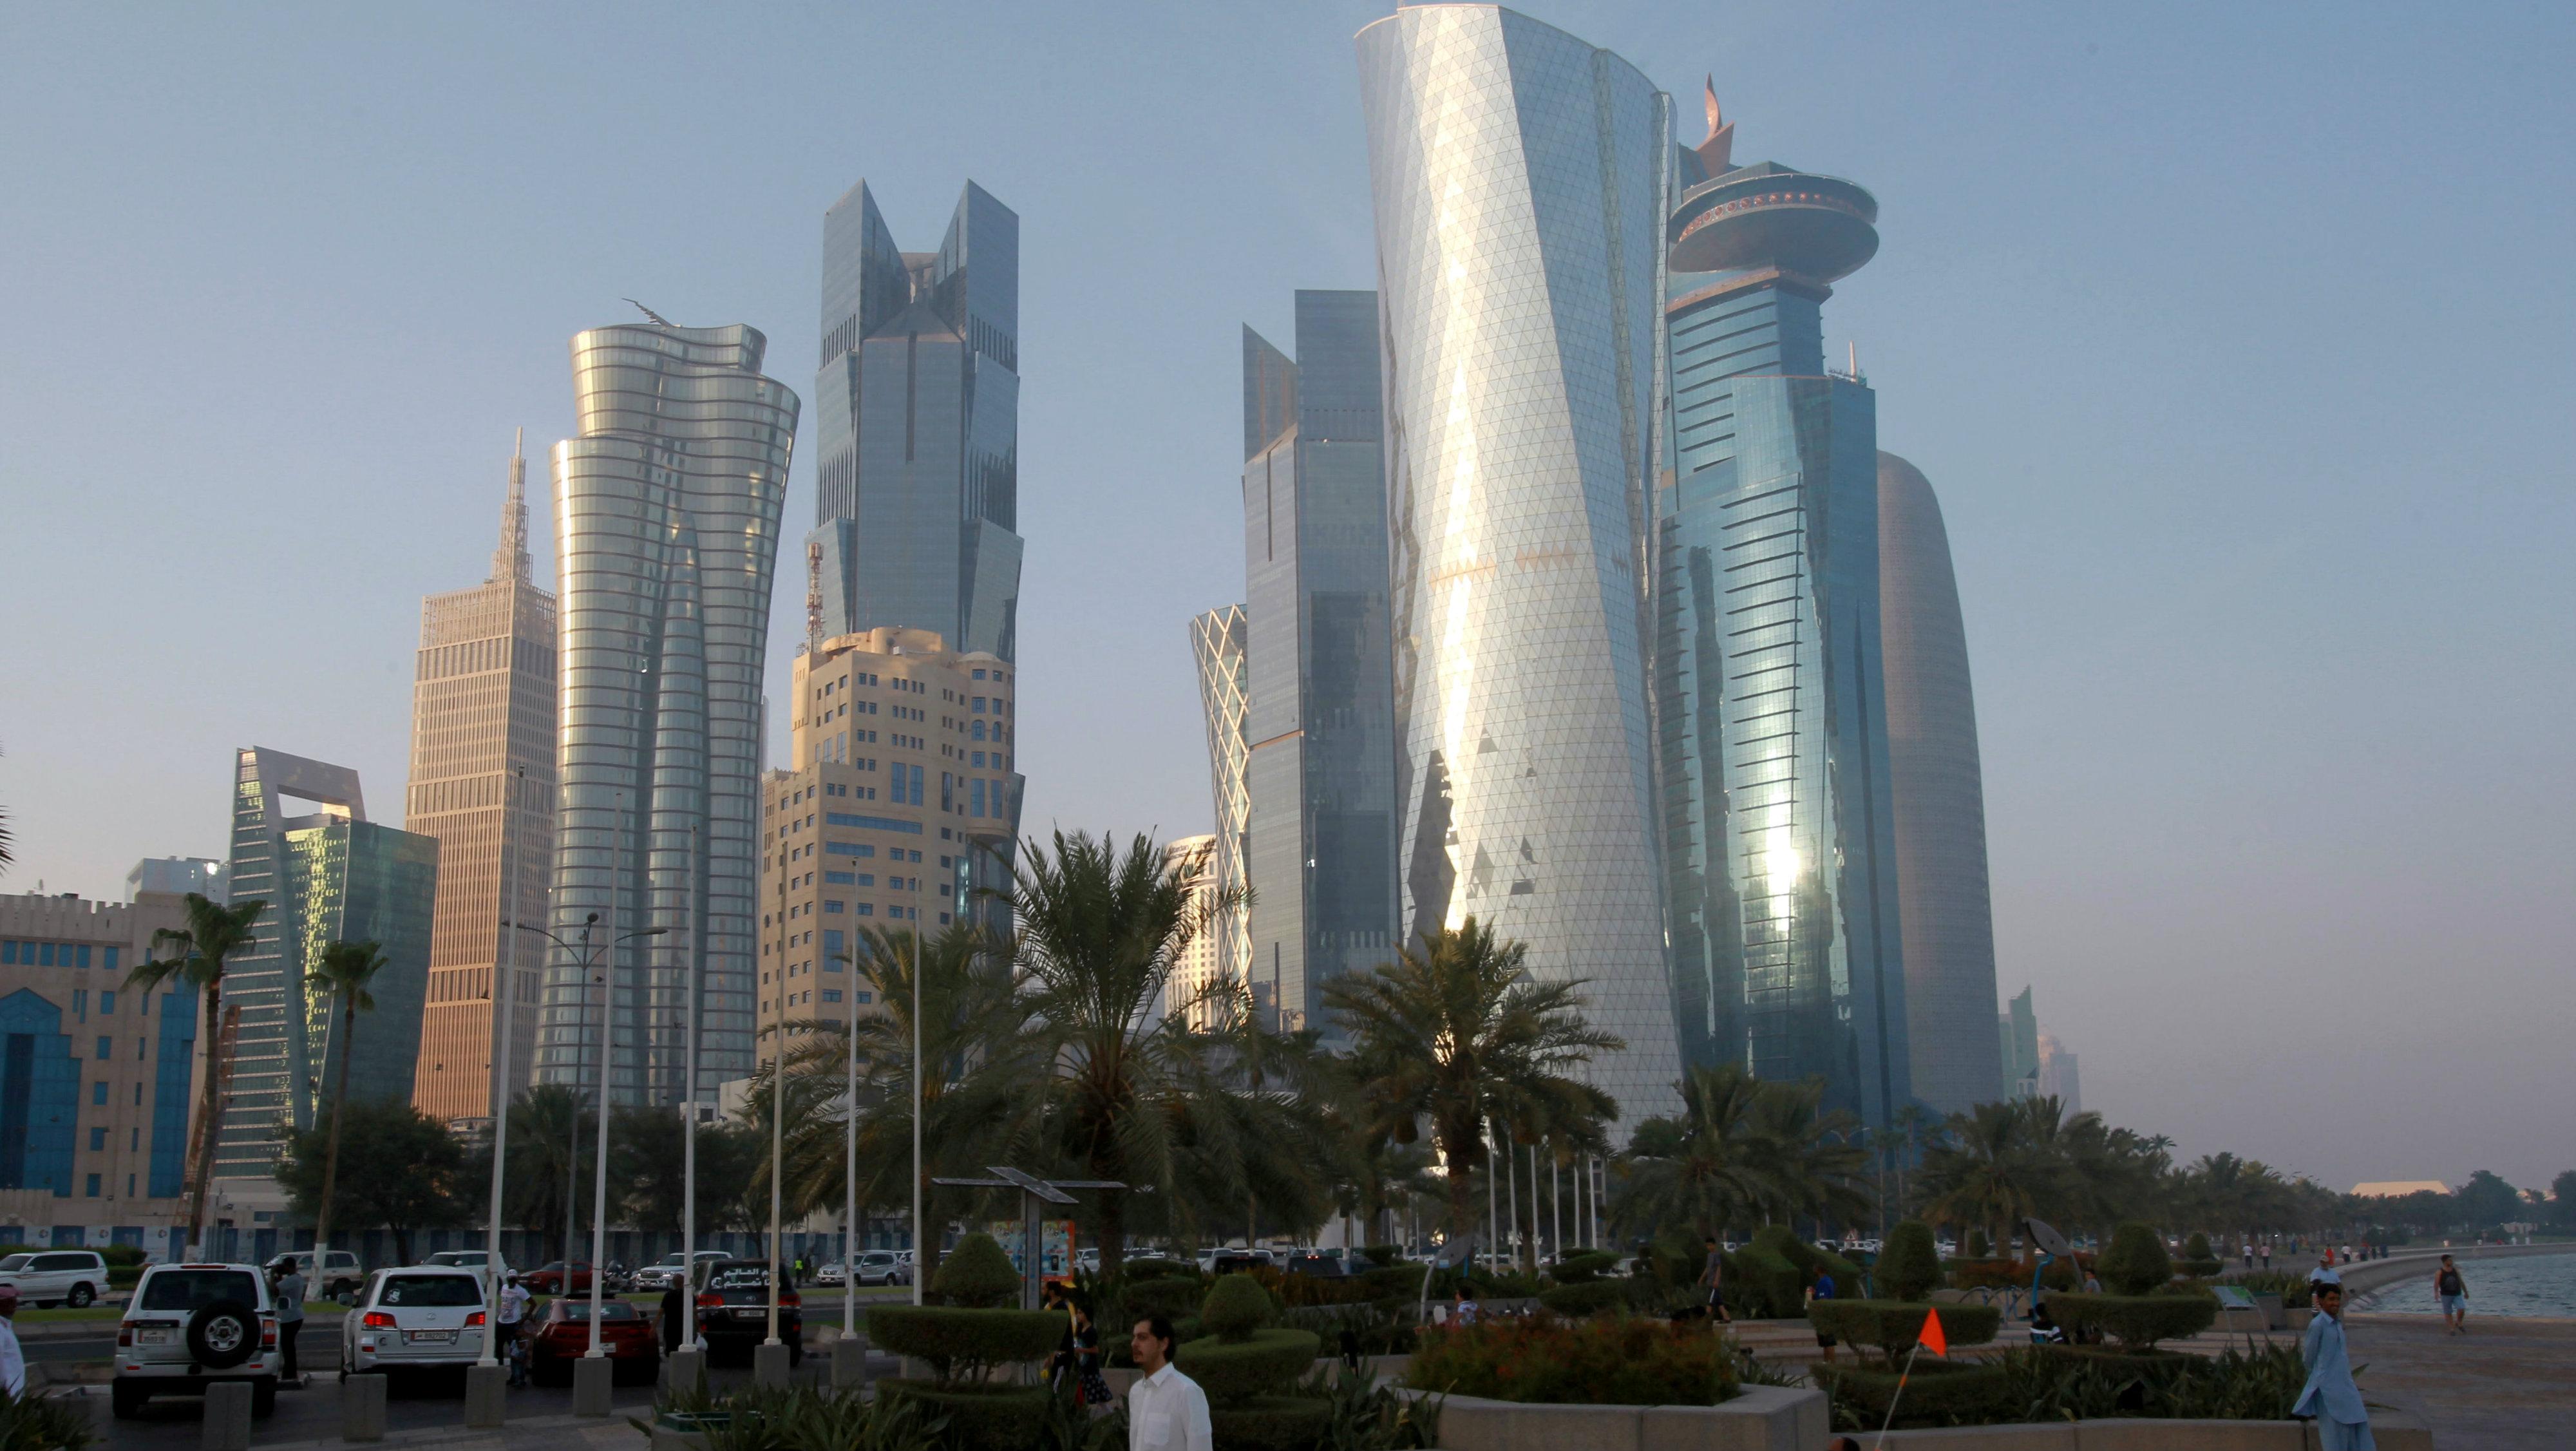 View of Doha, Qatar